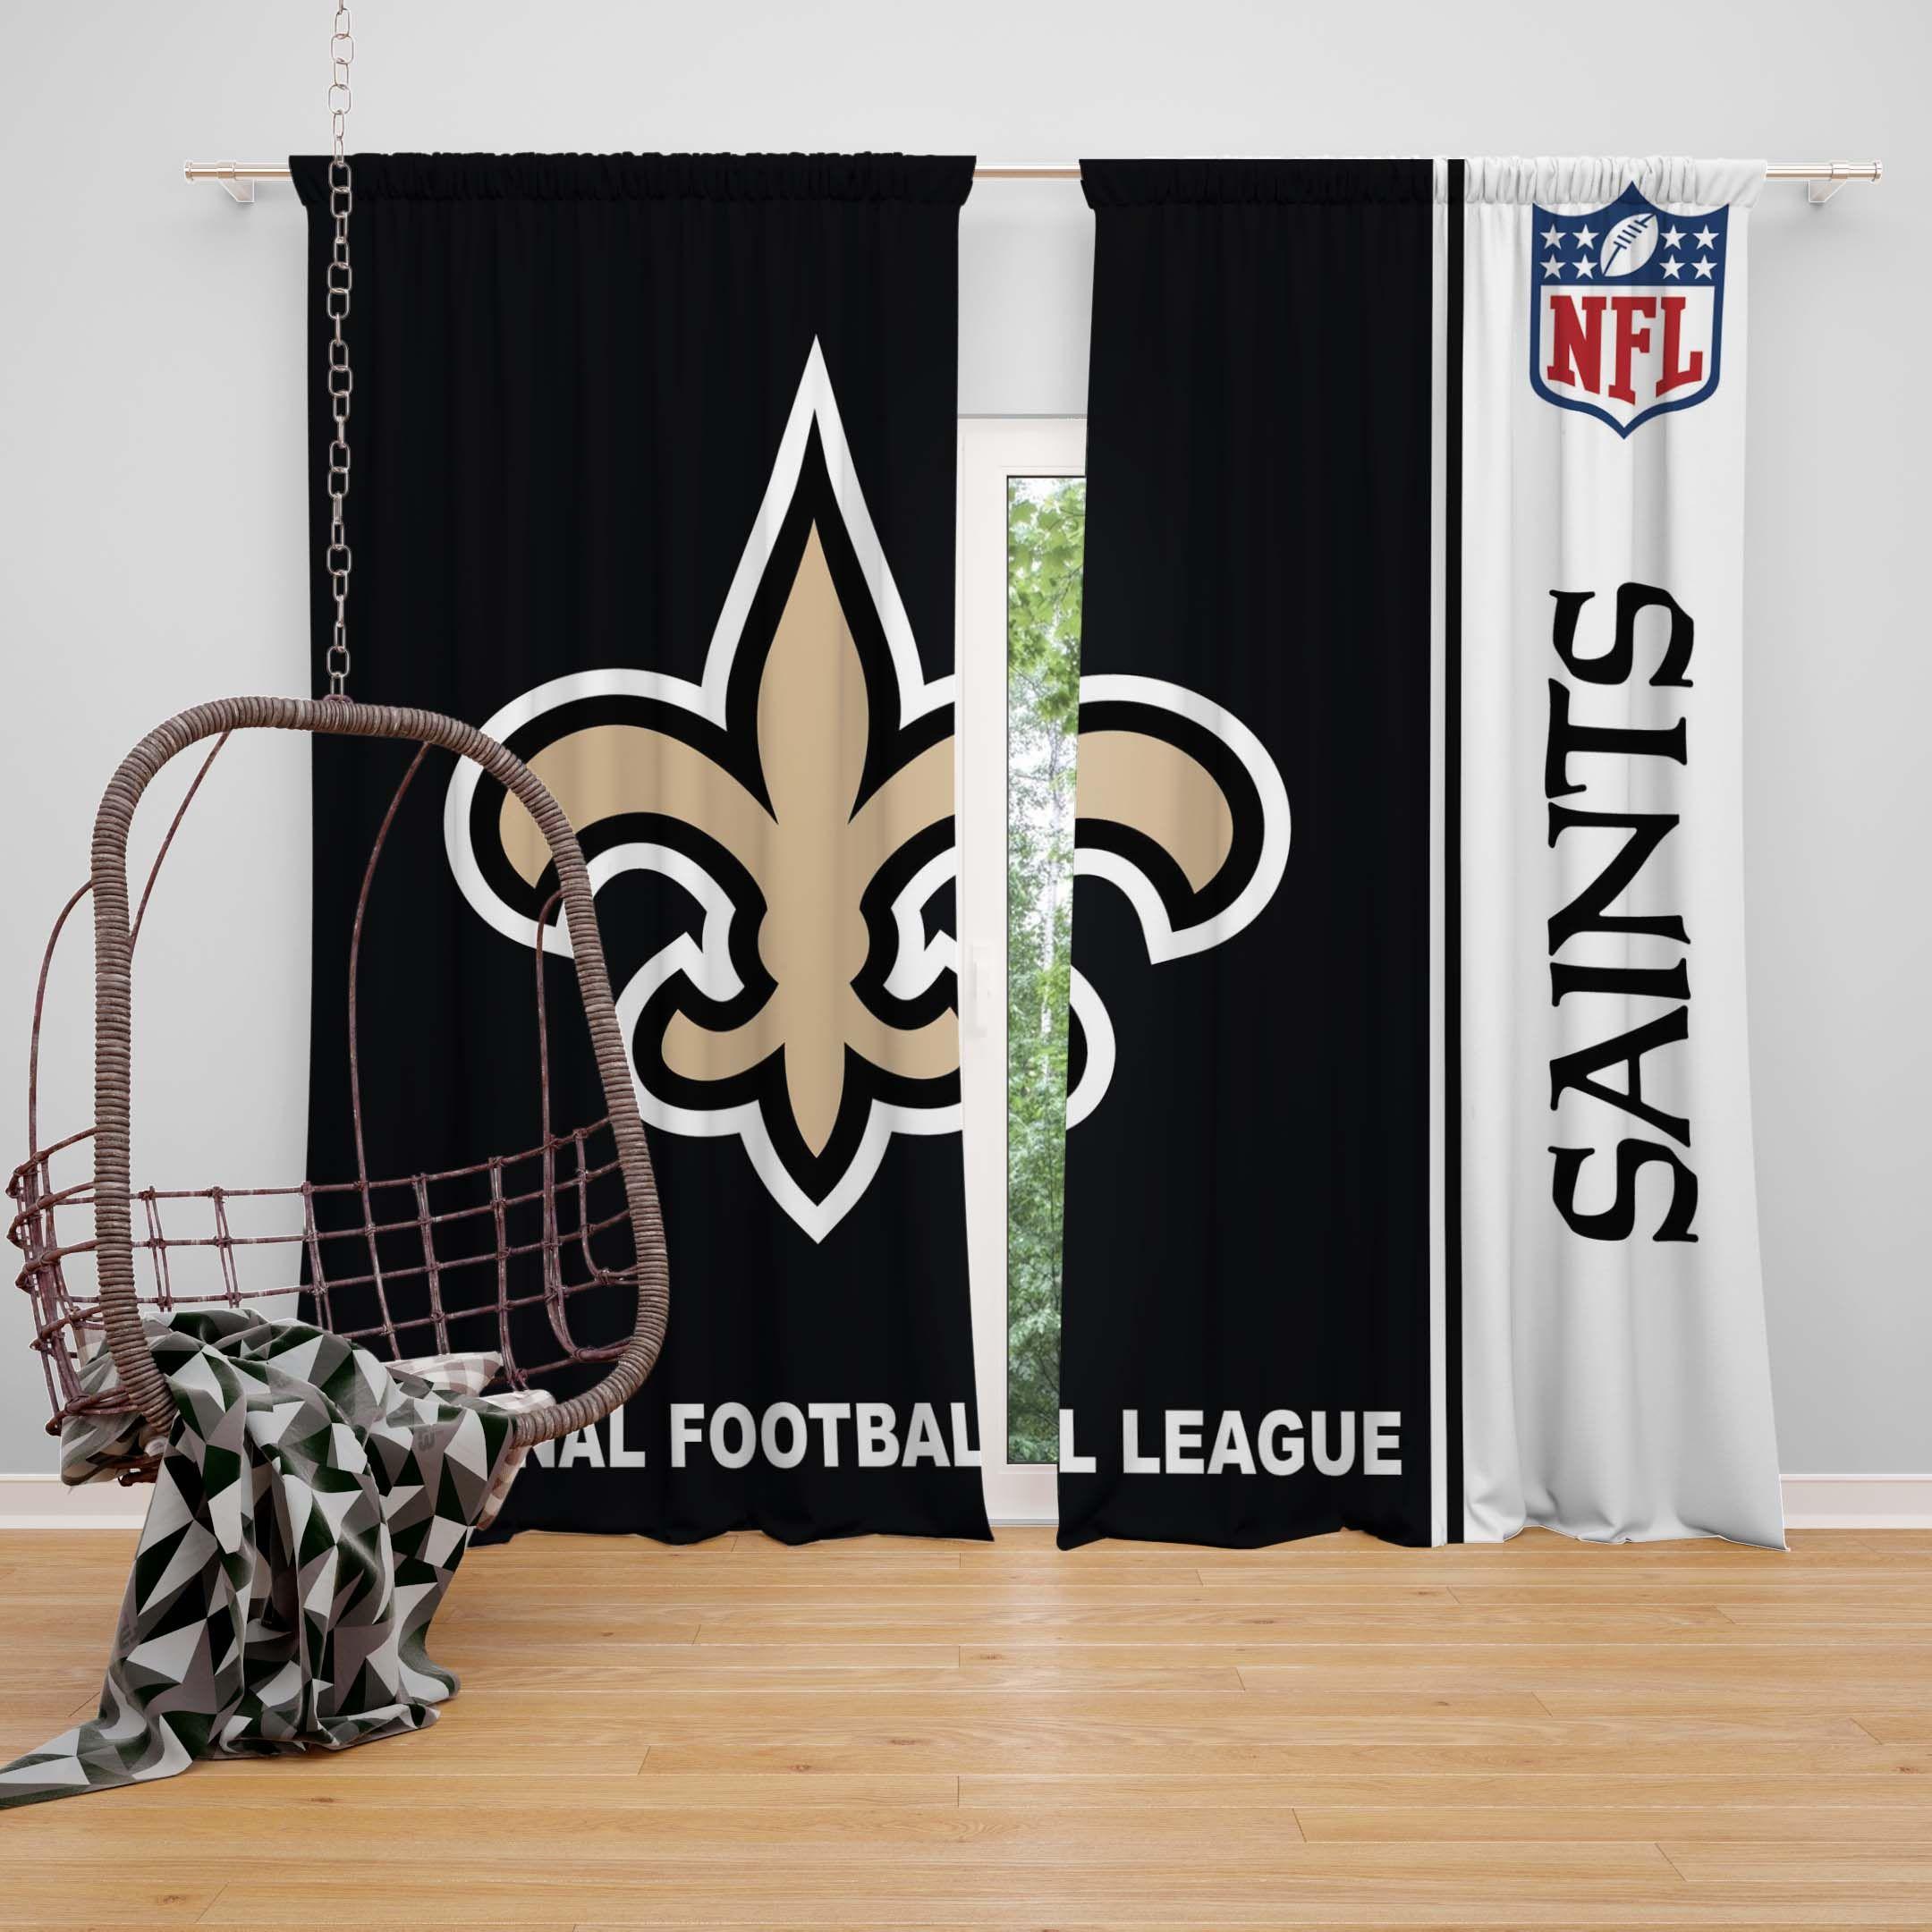 Nfl New Orleans Saints Bedroom Curtain New Orleans Saints New